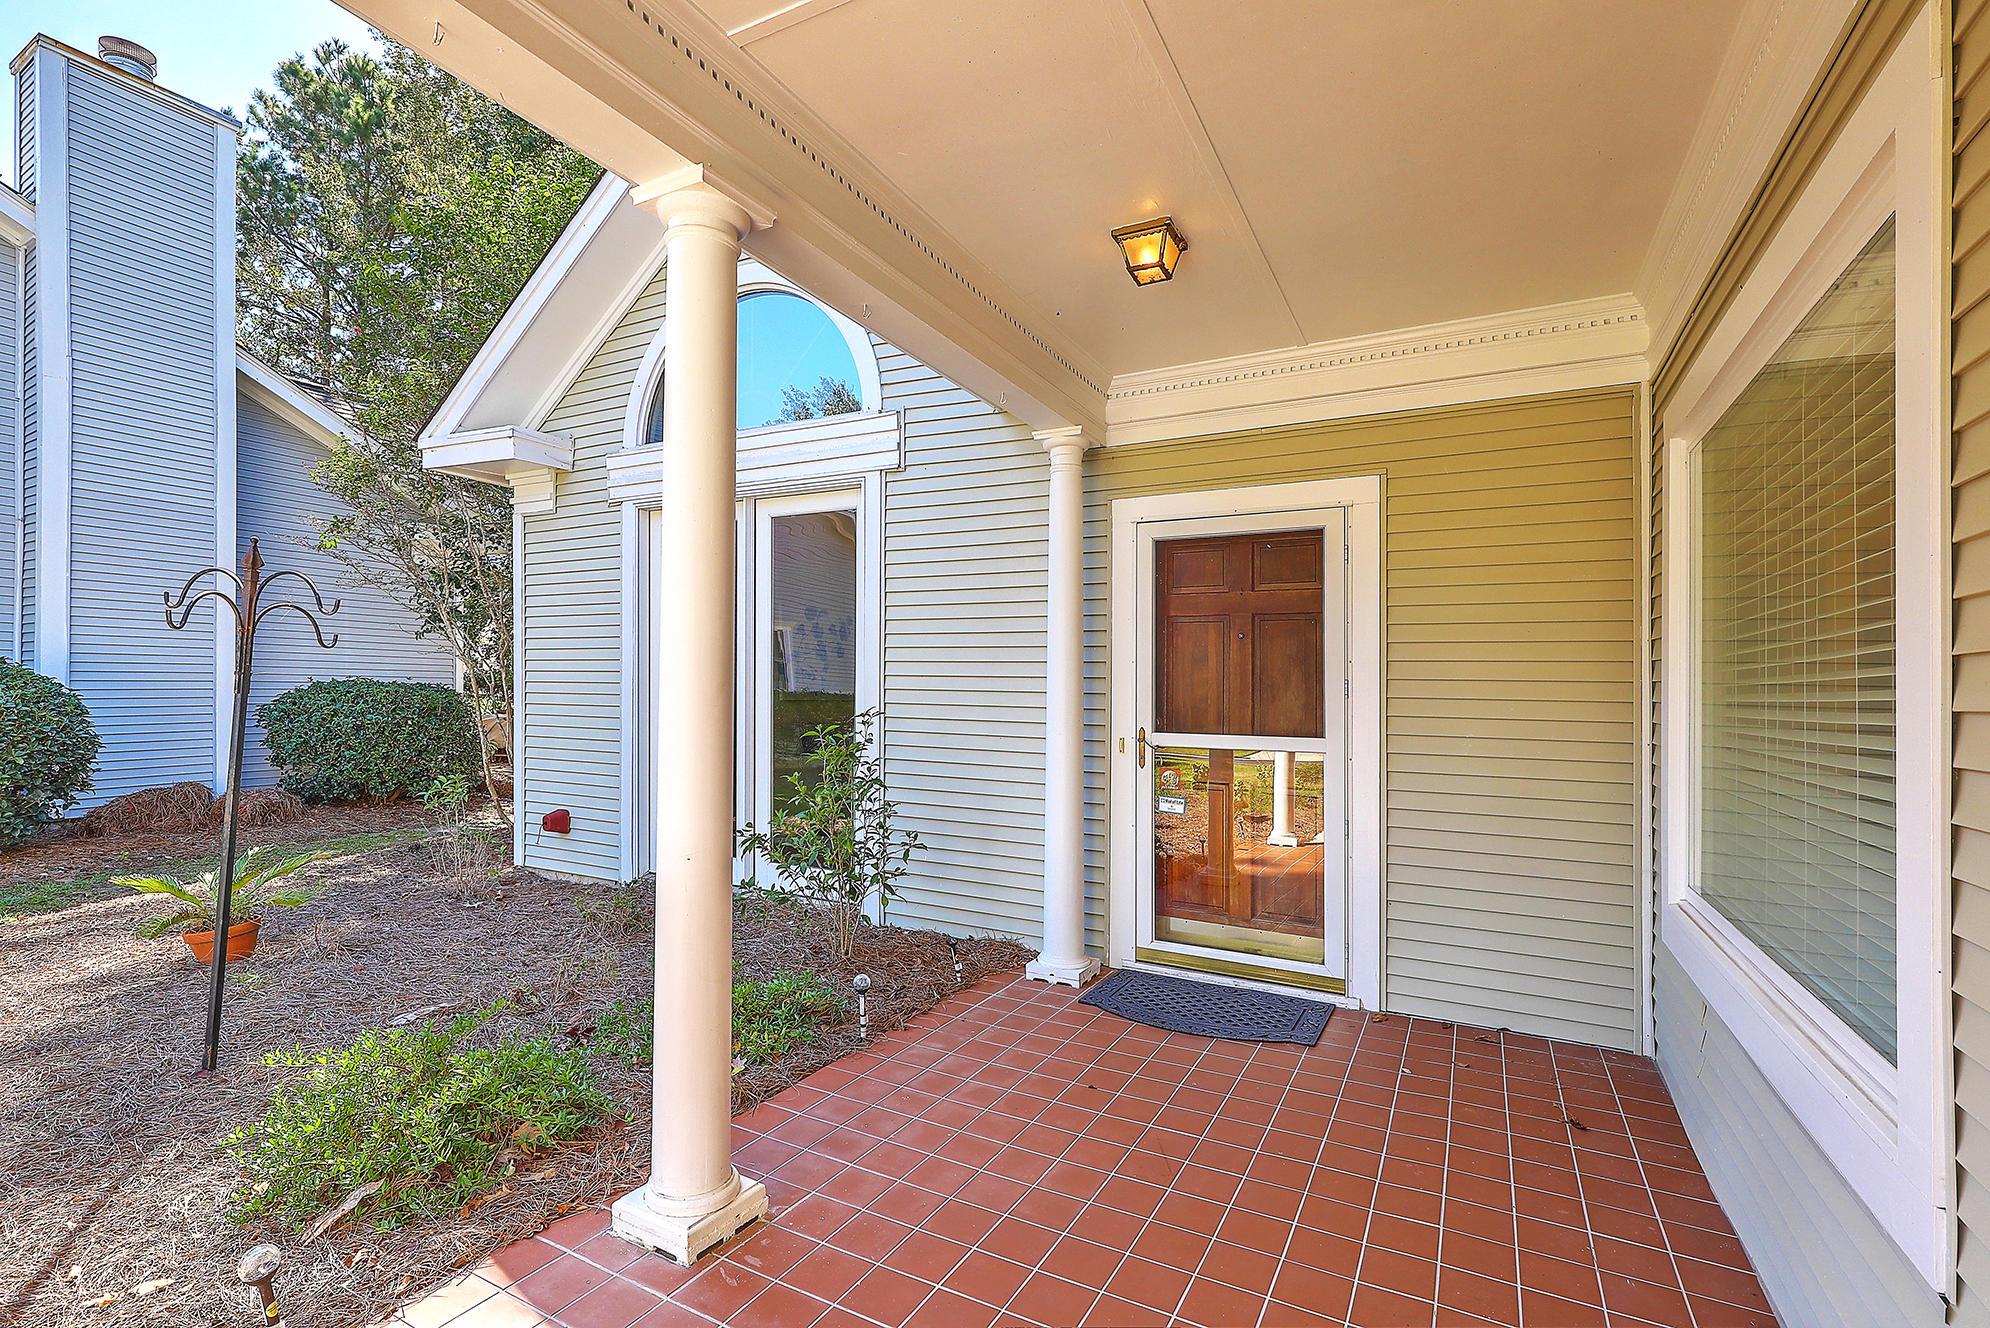 Elms of Charleston Homes For Sale - 9121 Lafayette, North Charleston, SC - 16